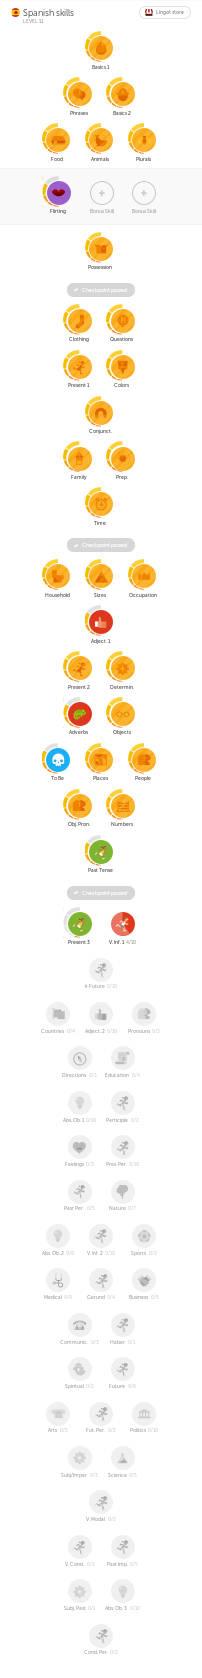 Duolingo Spanisch 2016-06-04